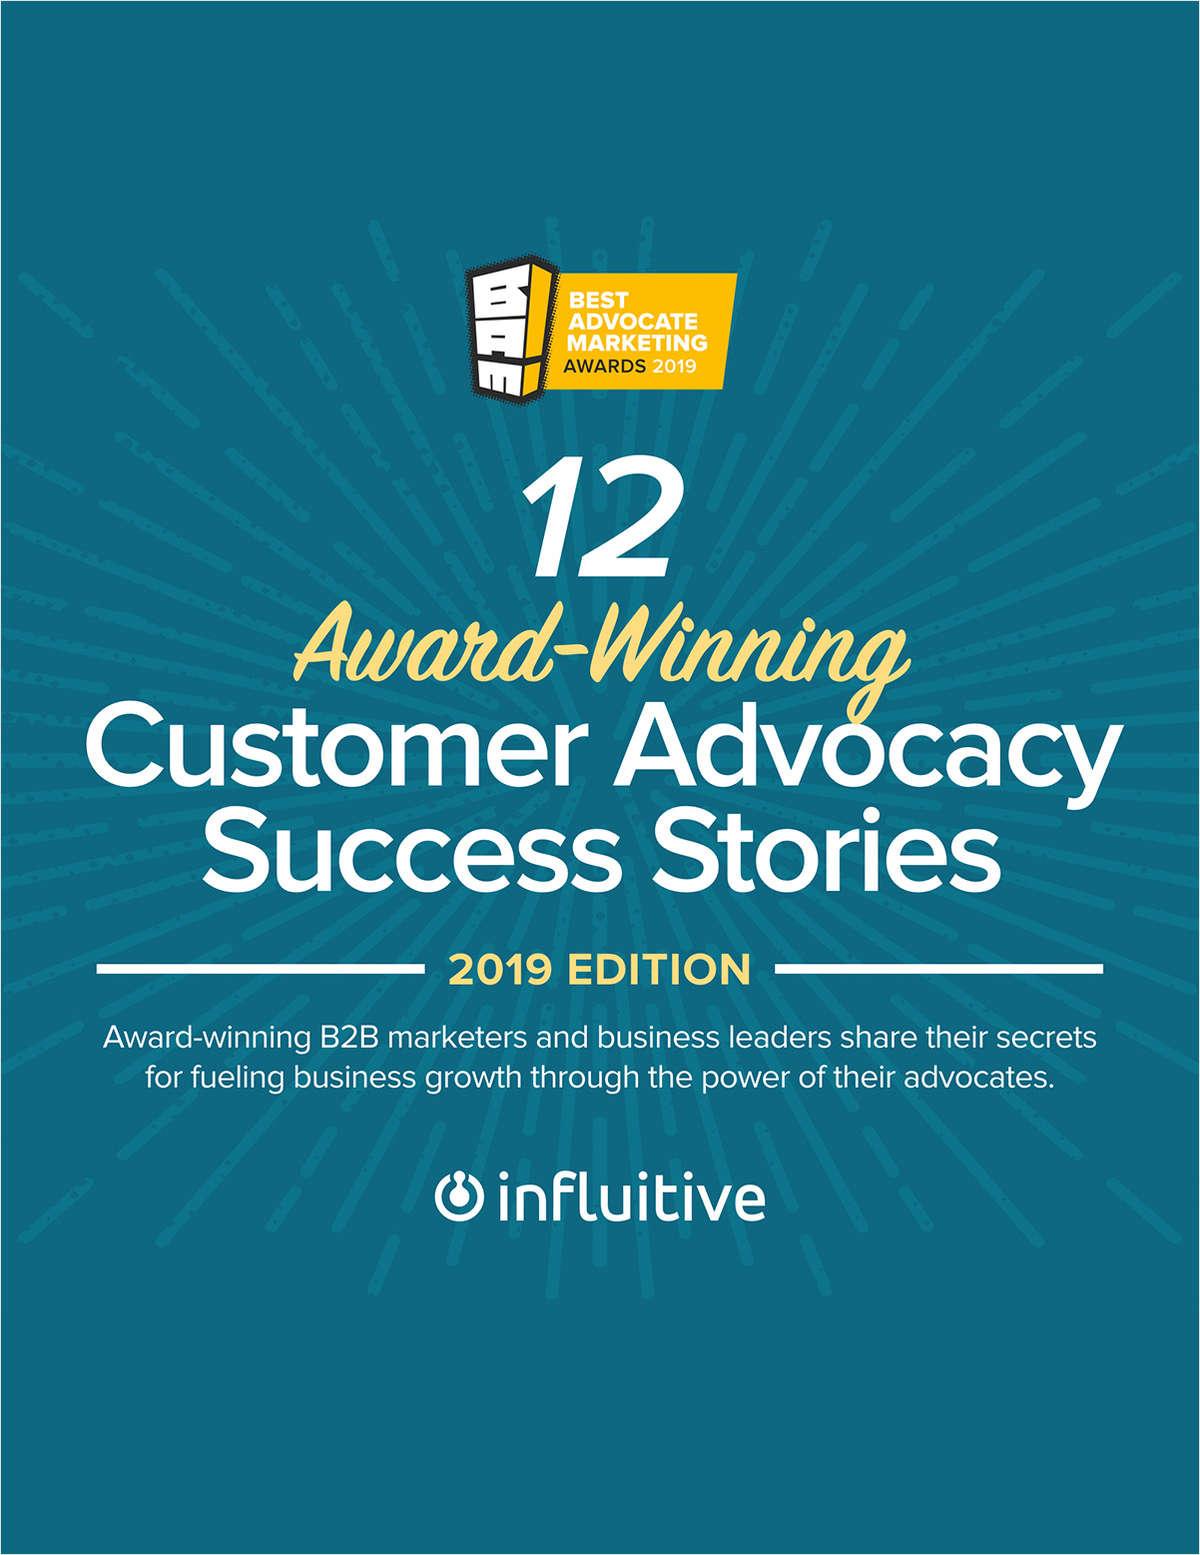 12 Award-Winning Customer Advocacy Success Stories